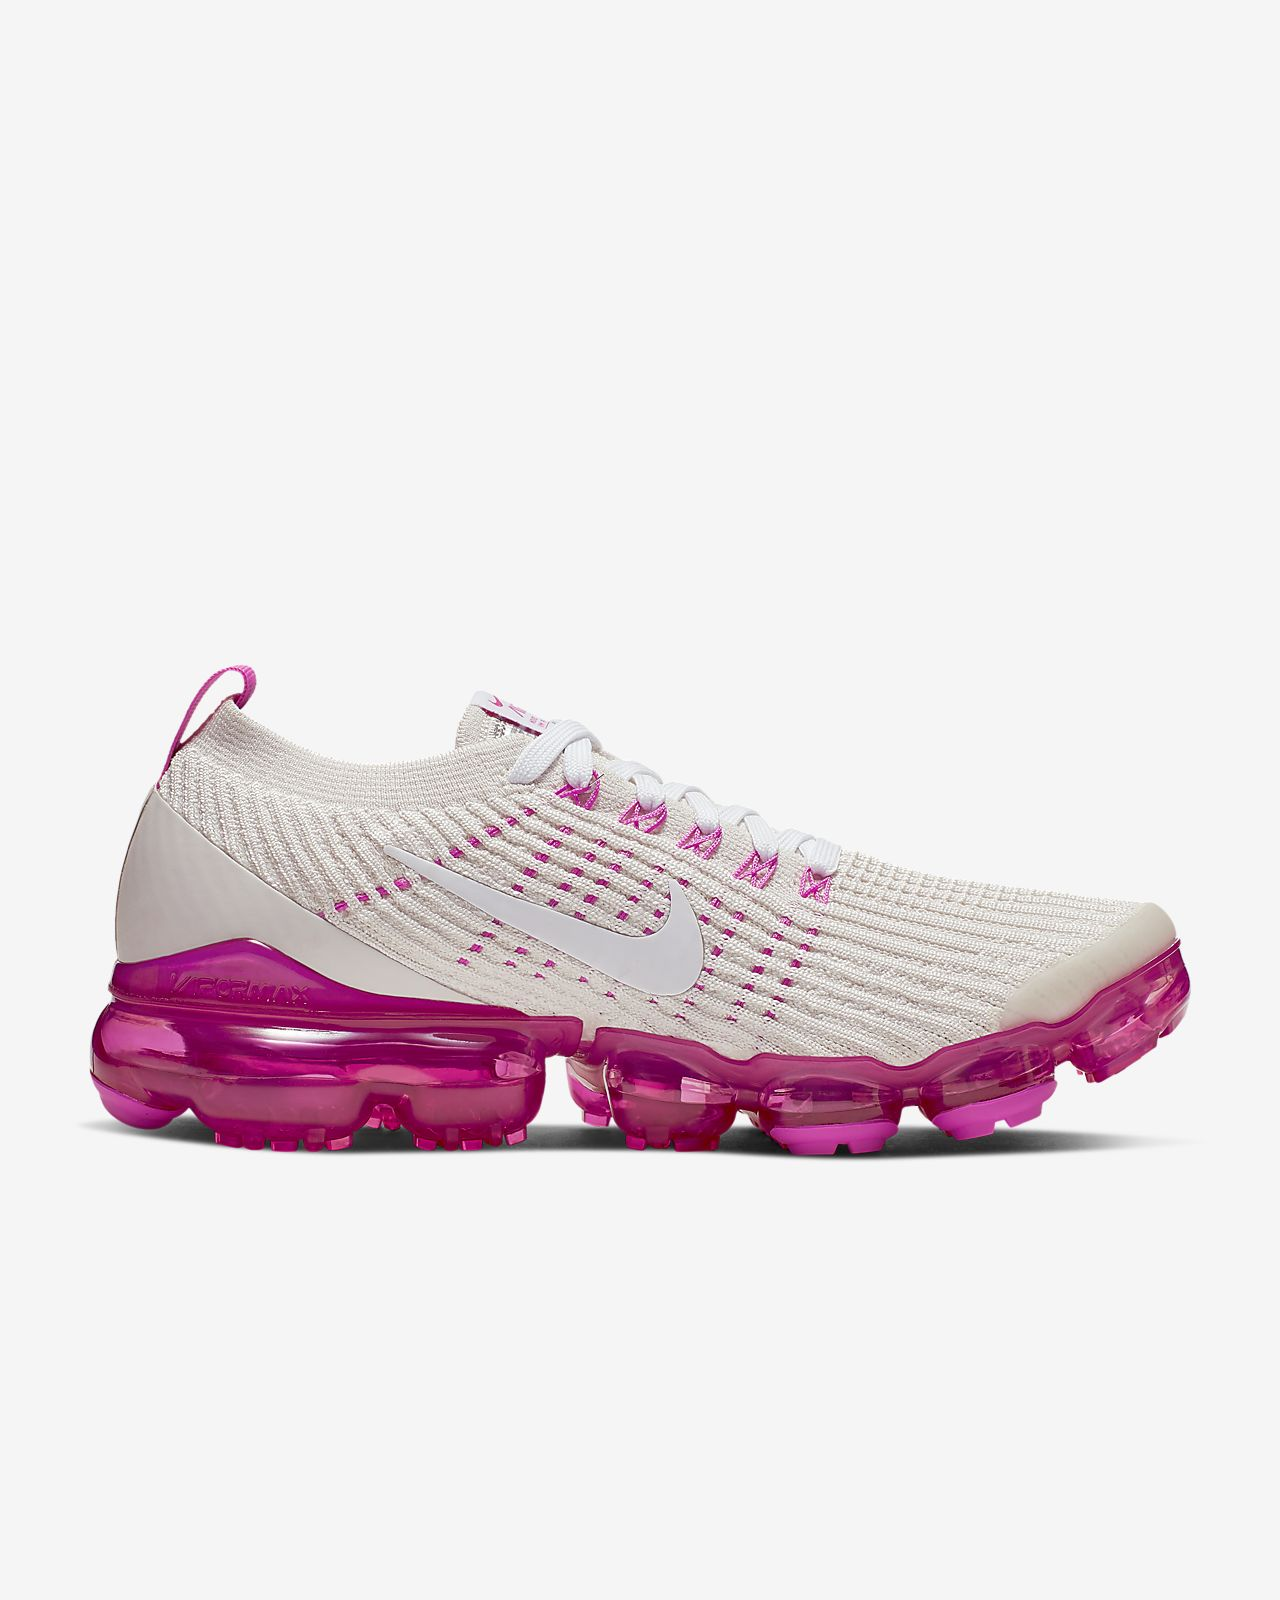 innovative design c8fd6 2b2ba ... Nike Air VaporMax Flyknit 3 Women s Shoe